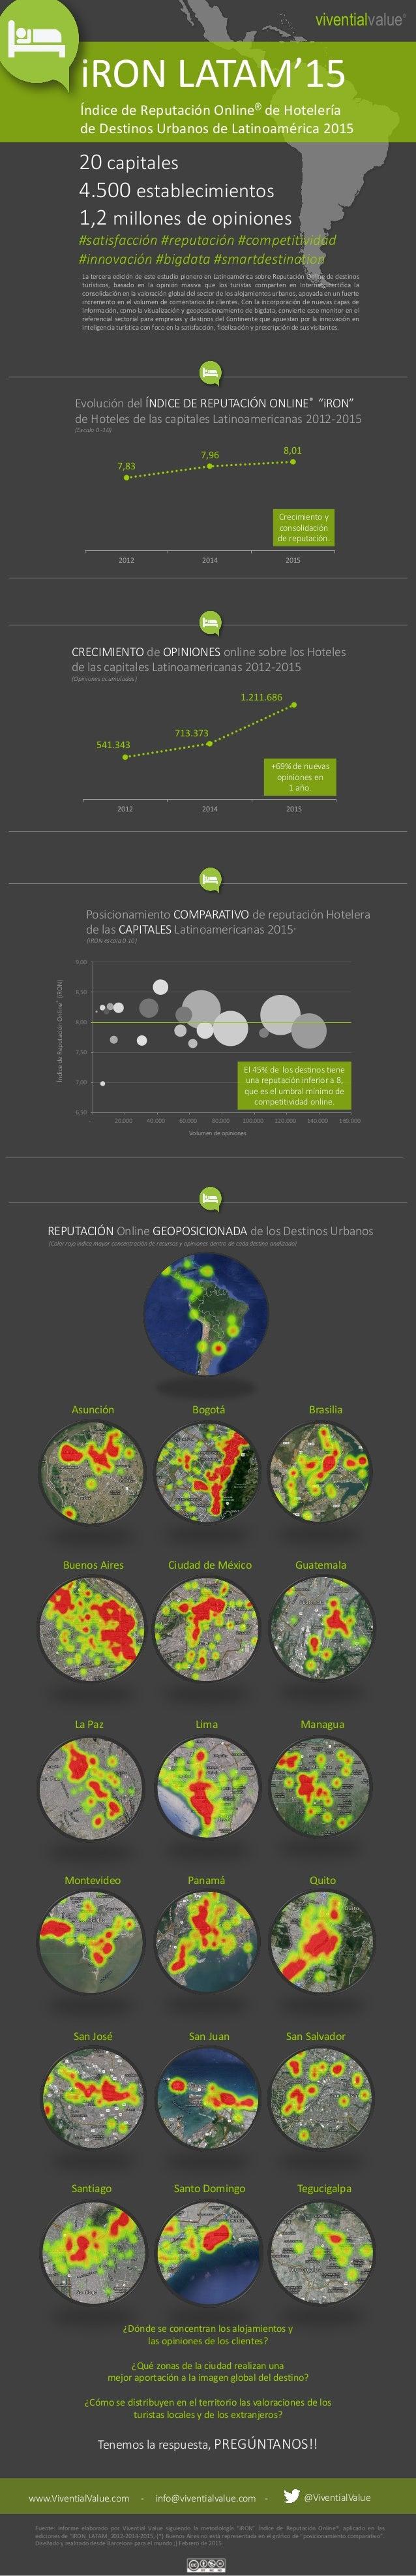 iRON LATAM'15 Índice de Reputación Online® de Hotelería de Destinos Urbanos de Latinoamérica 2015 viventialvalue® 20 capit...